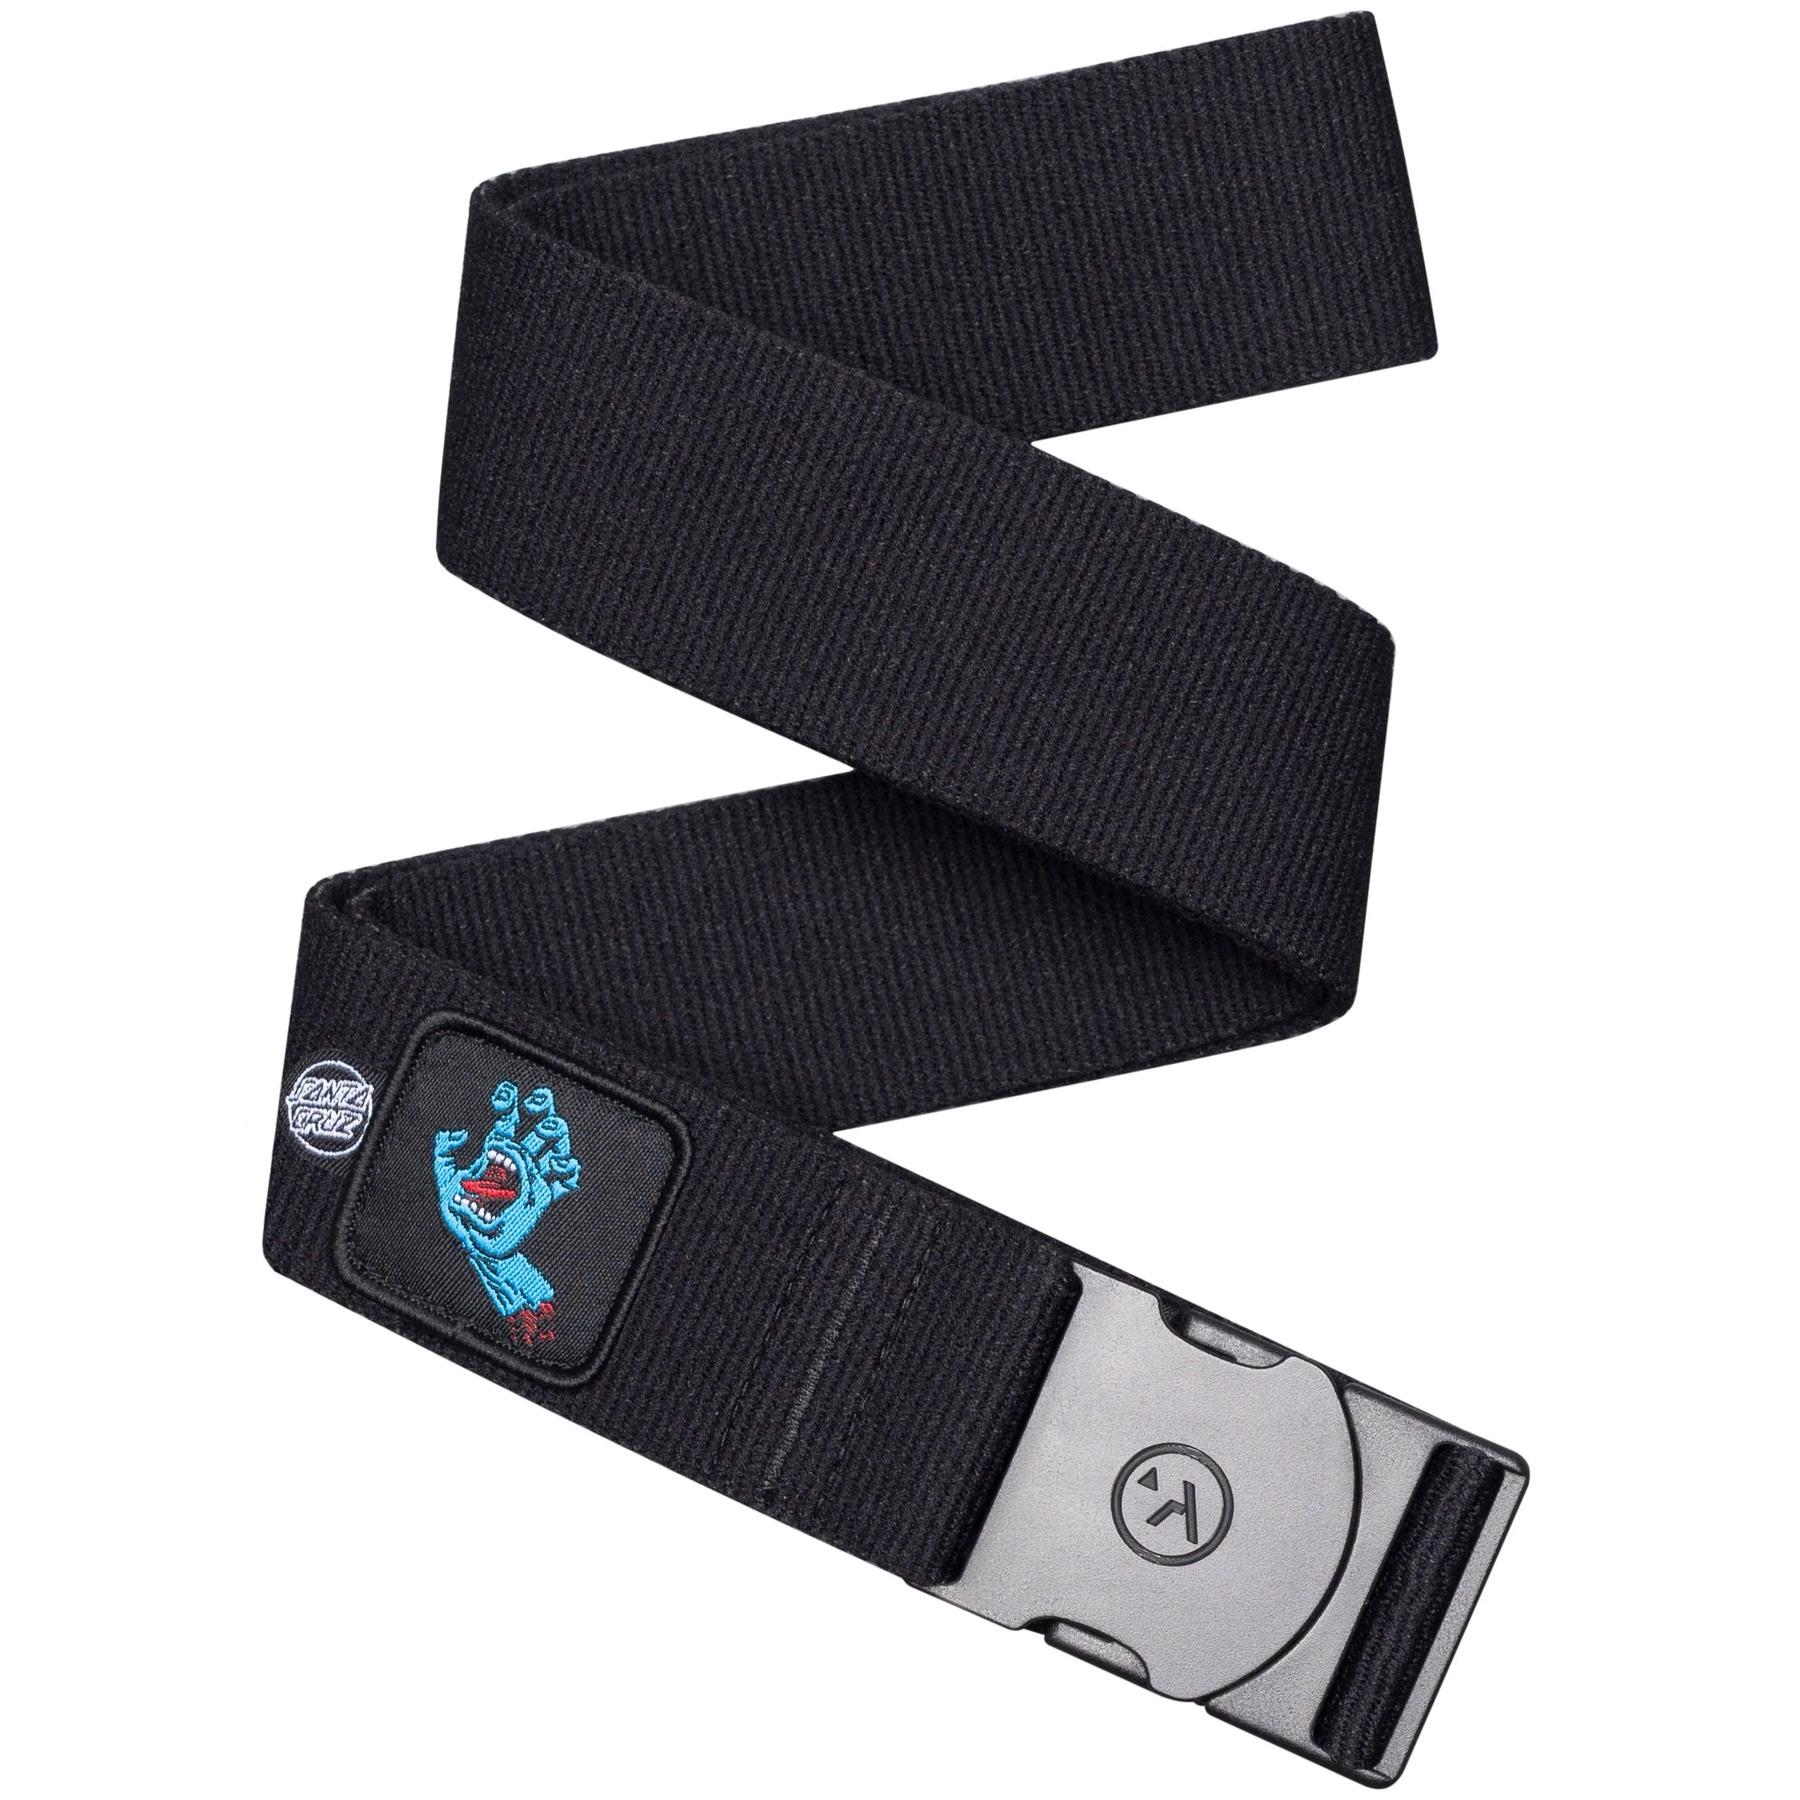 Arcade Rambler Santa Cruz Collab Belt - Black / Screaming Hand